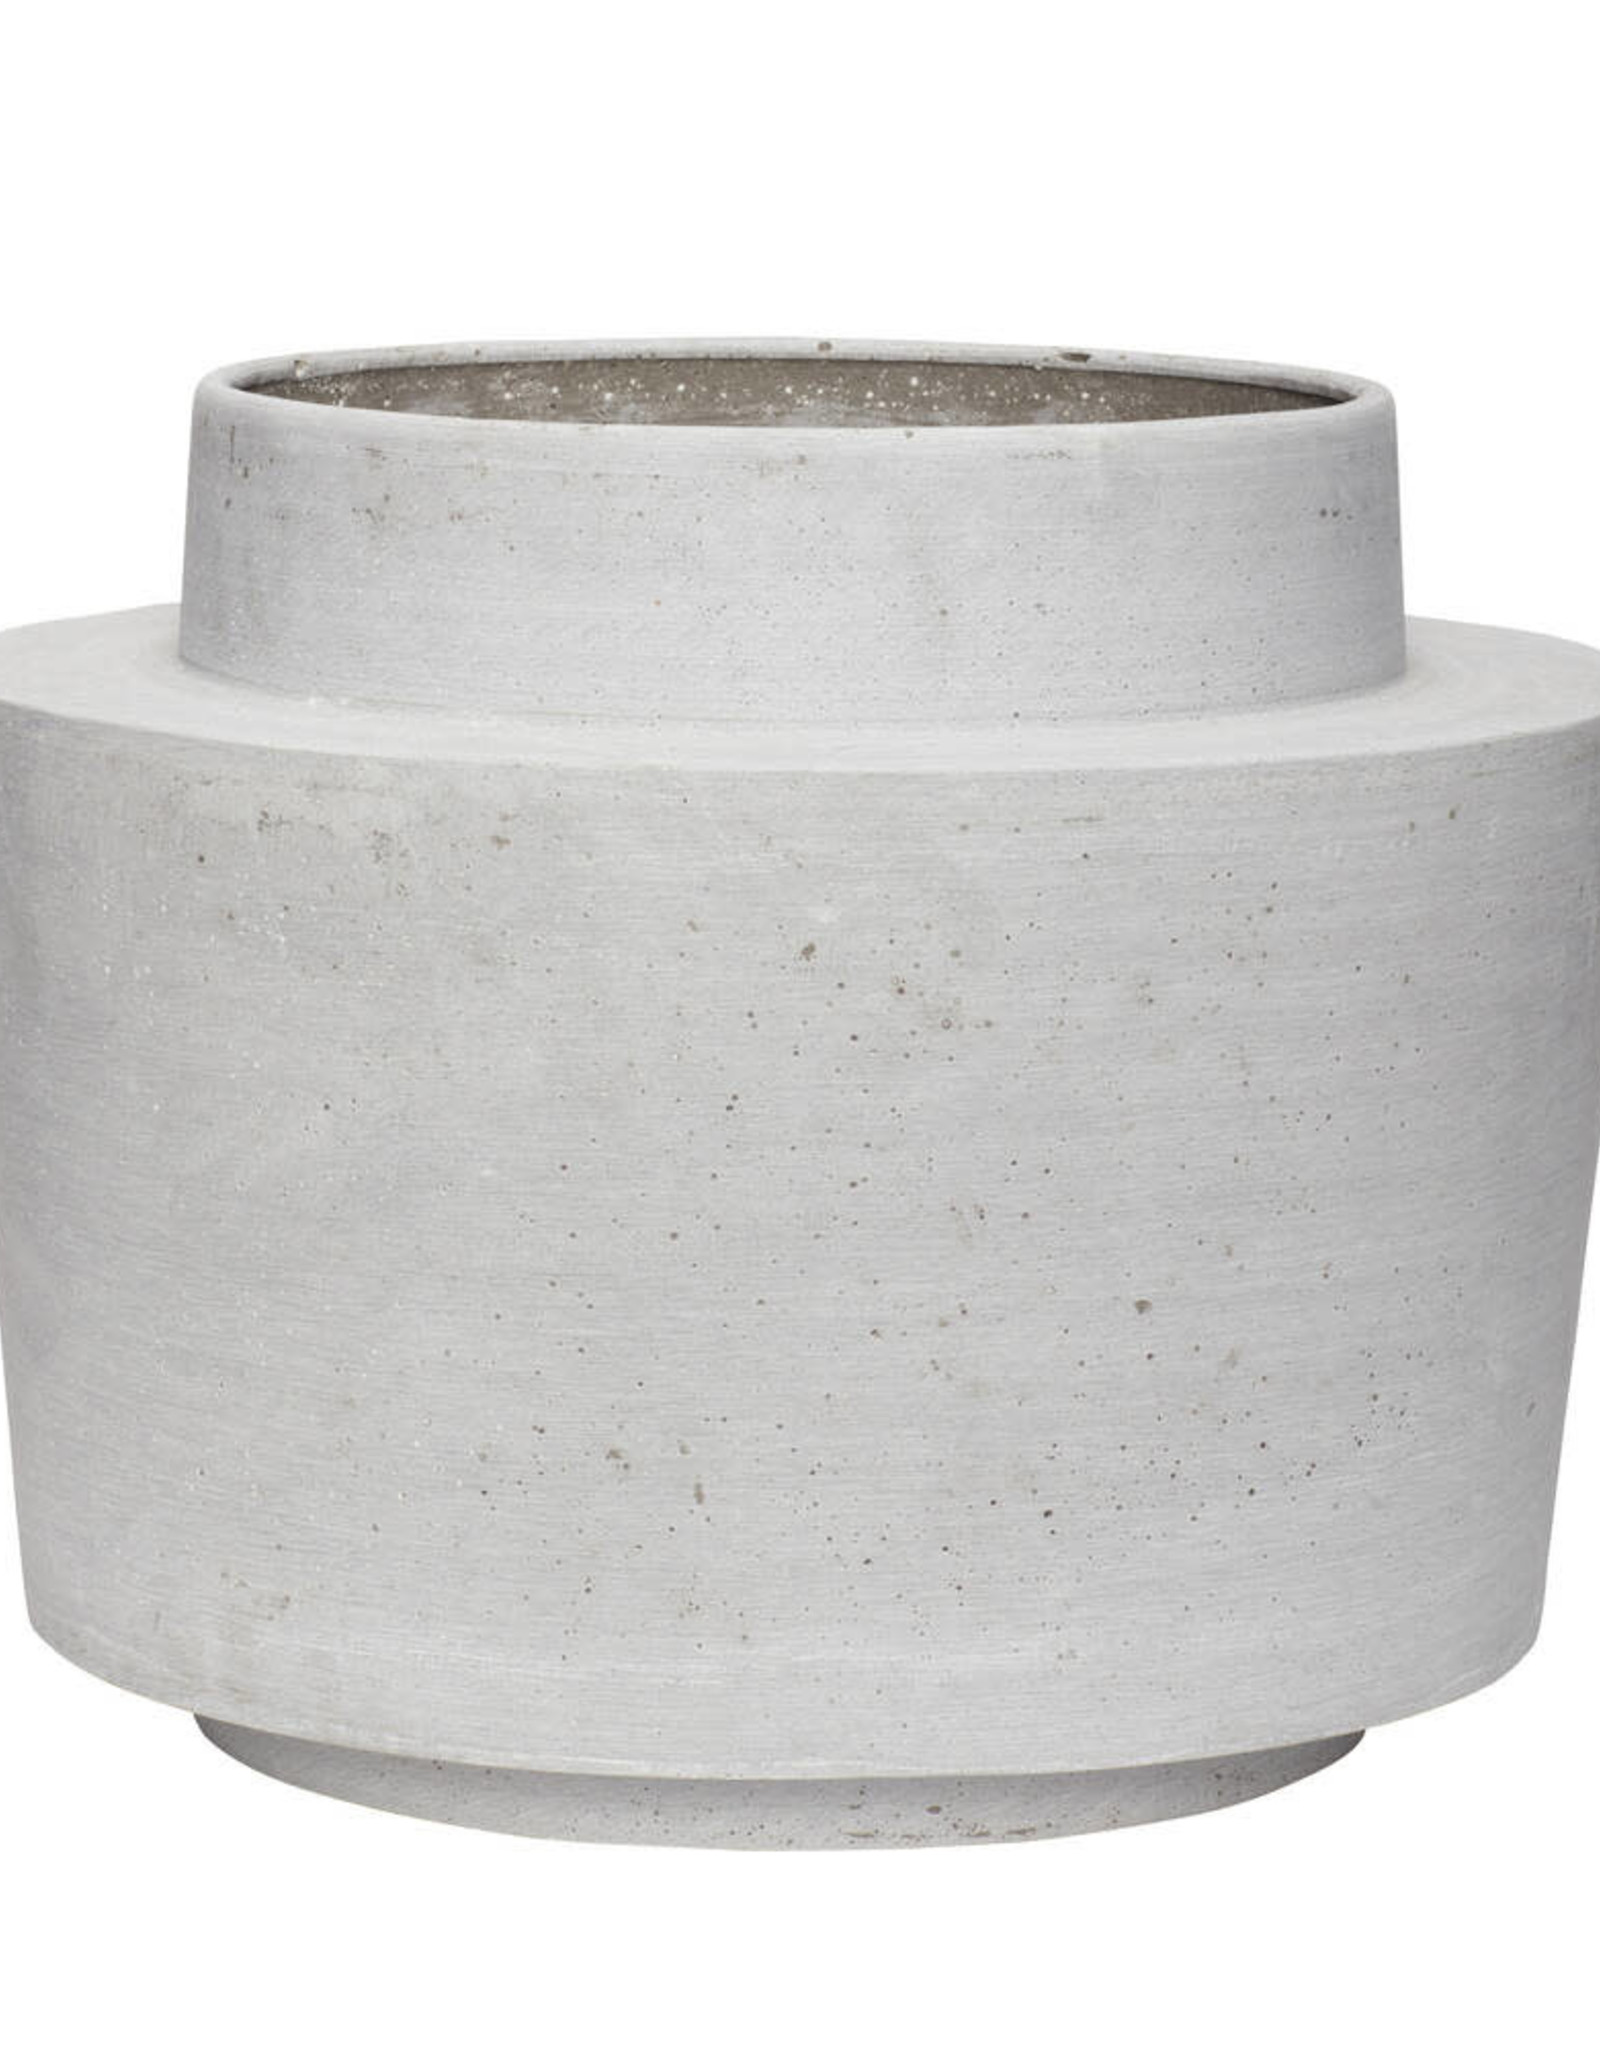 Hübsch Fiberstone Pot - Grey ø31xh36